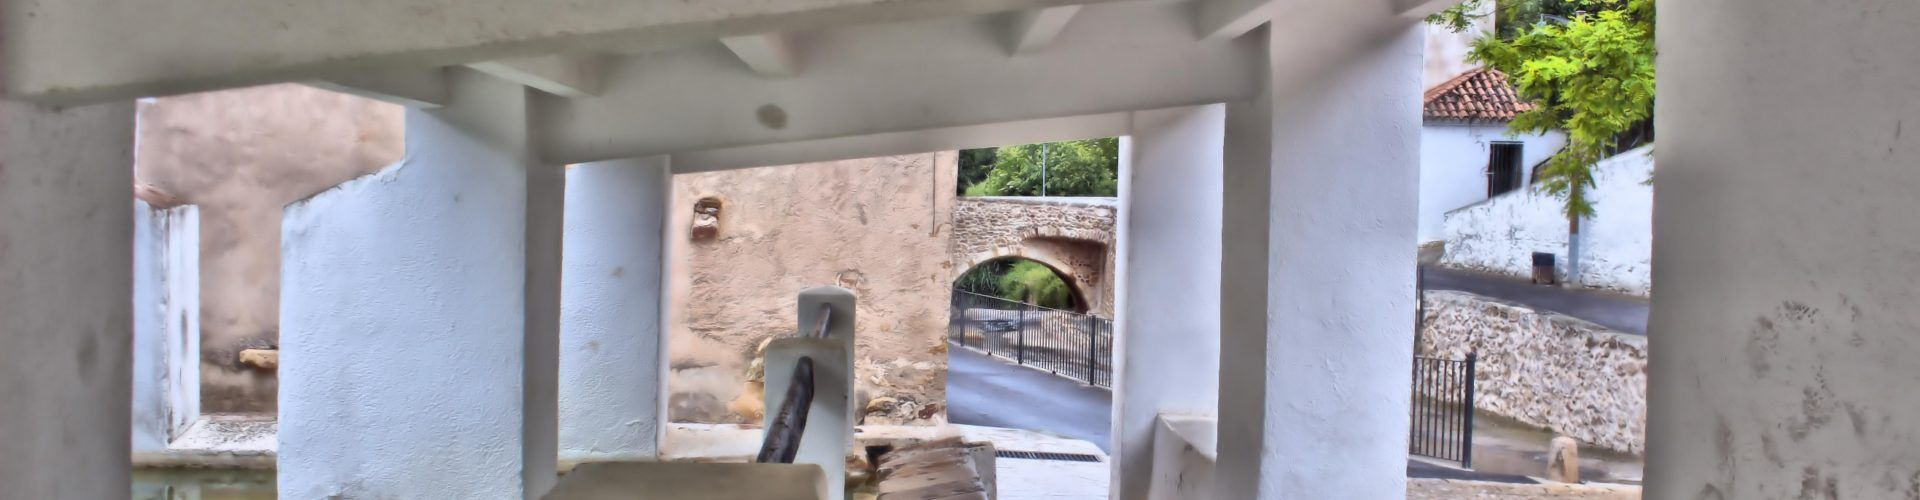 Ben Vist: Font de Sant Vicent, Traiguera